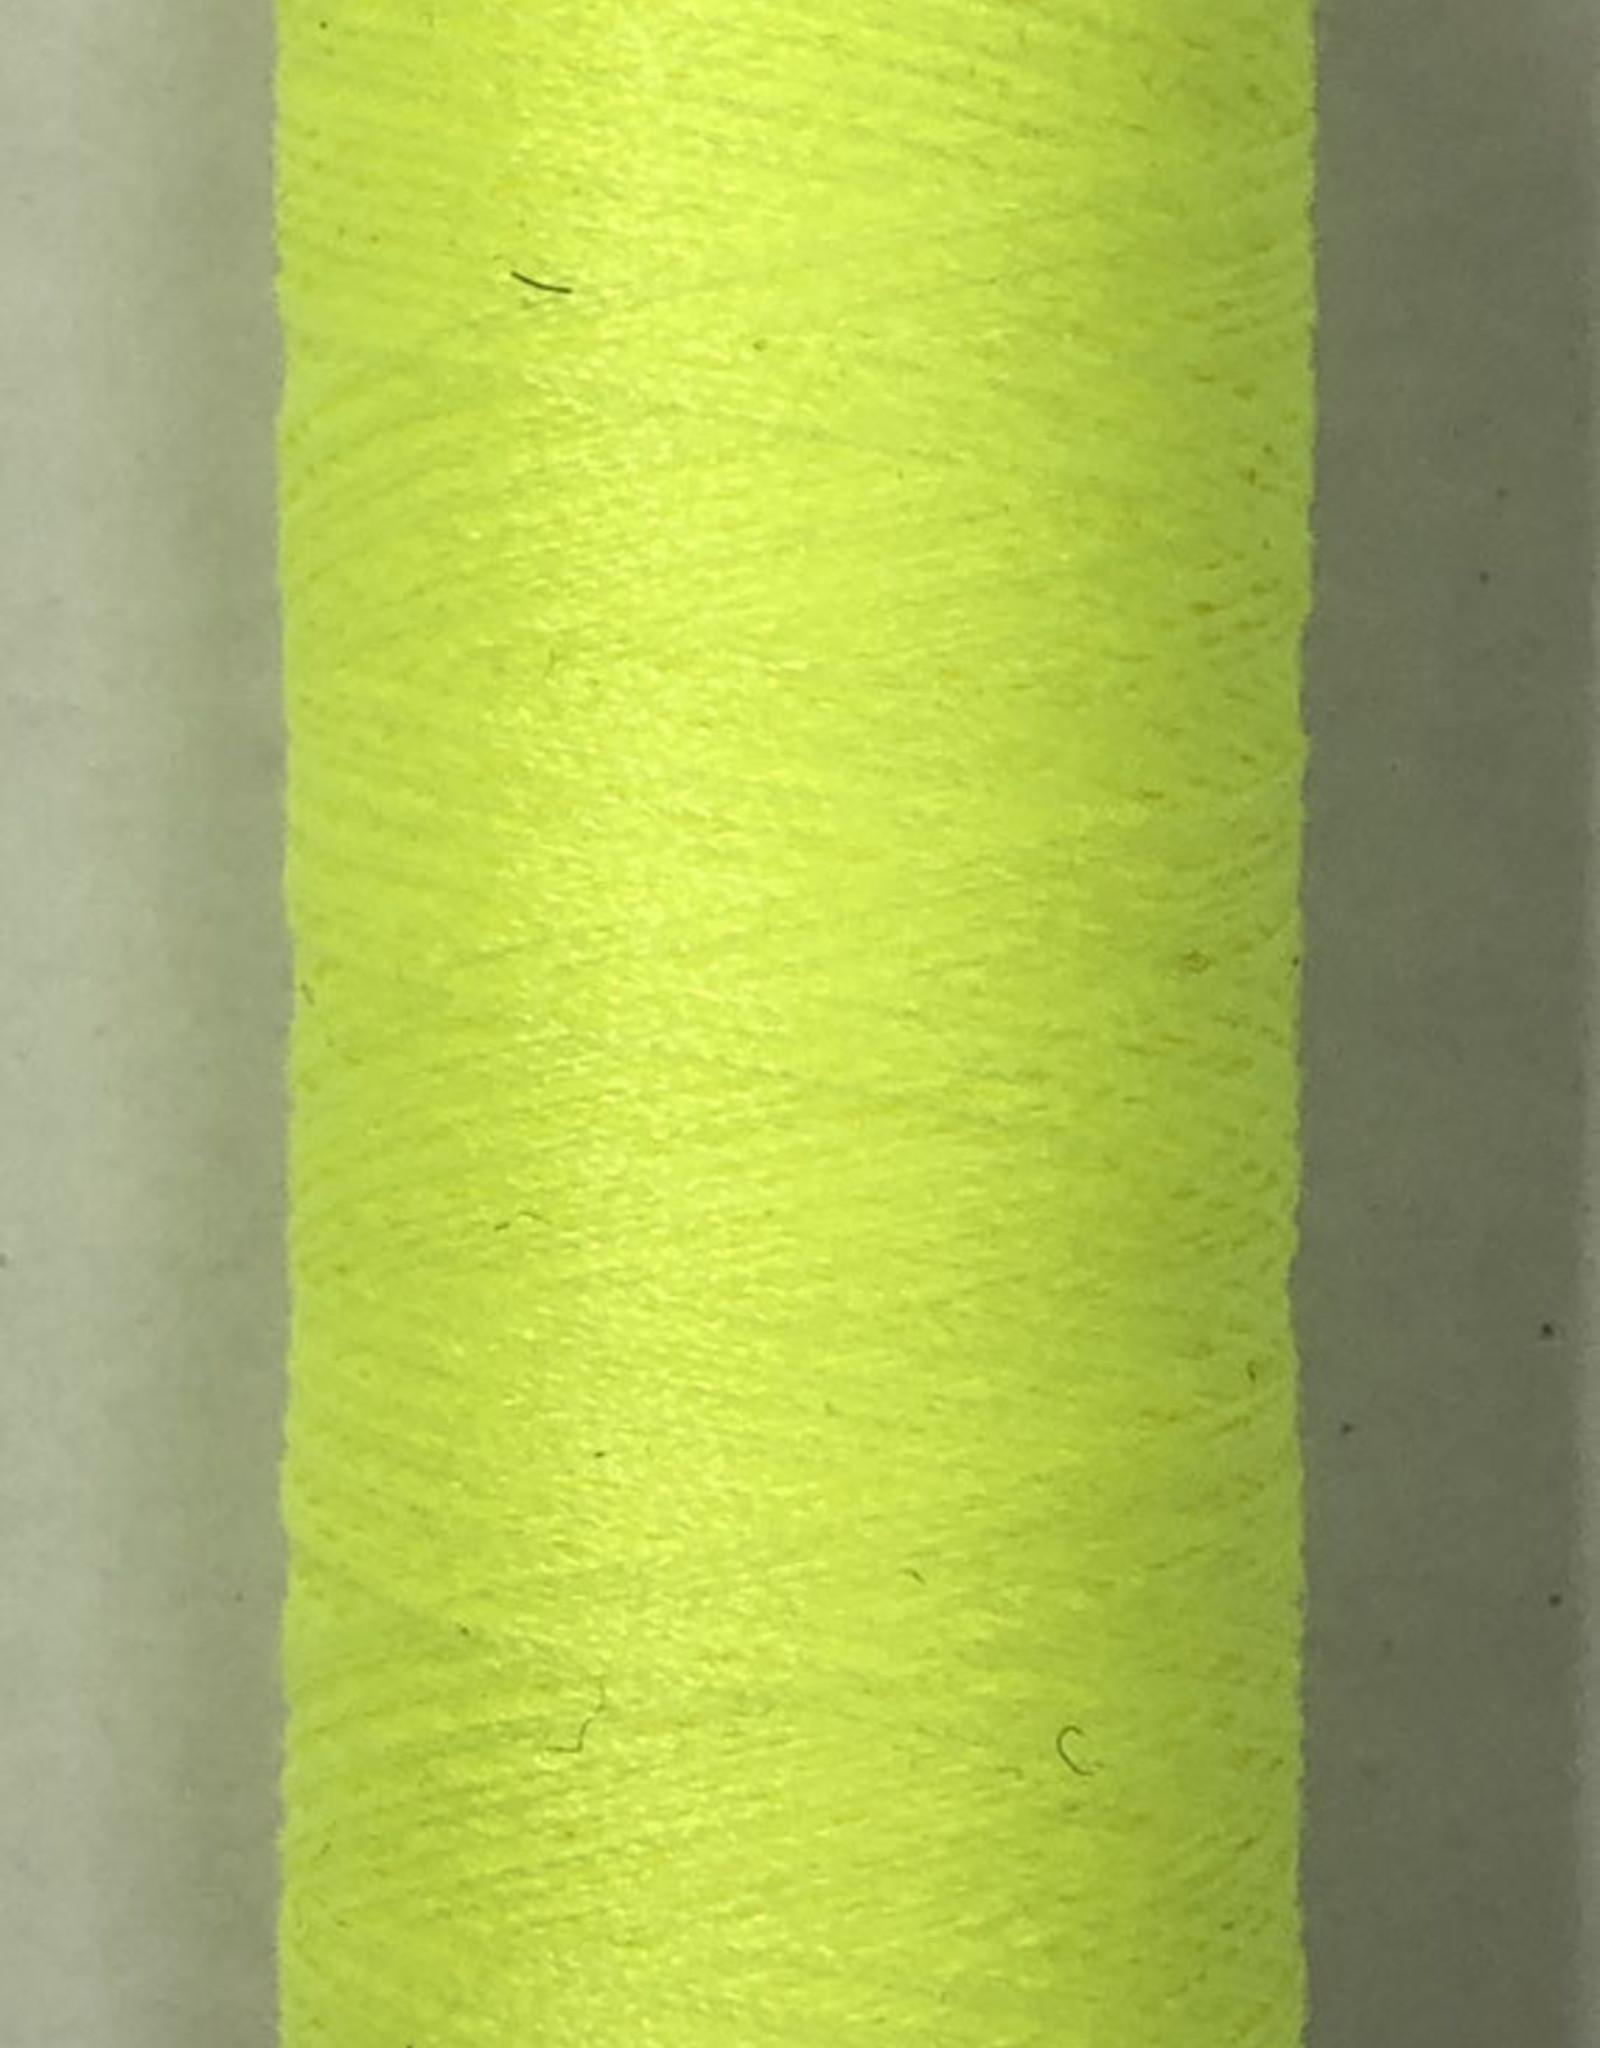 Gütermann Alles naaigaren Gütermann 100m neon geel col.3835